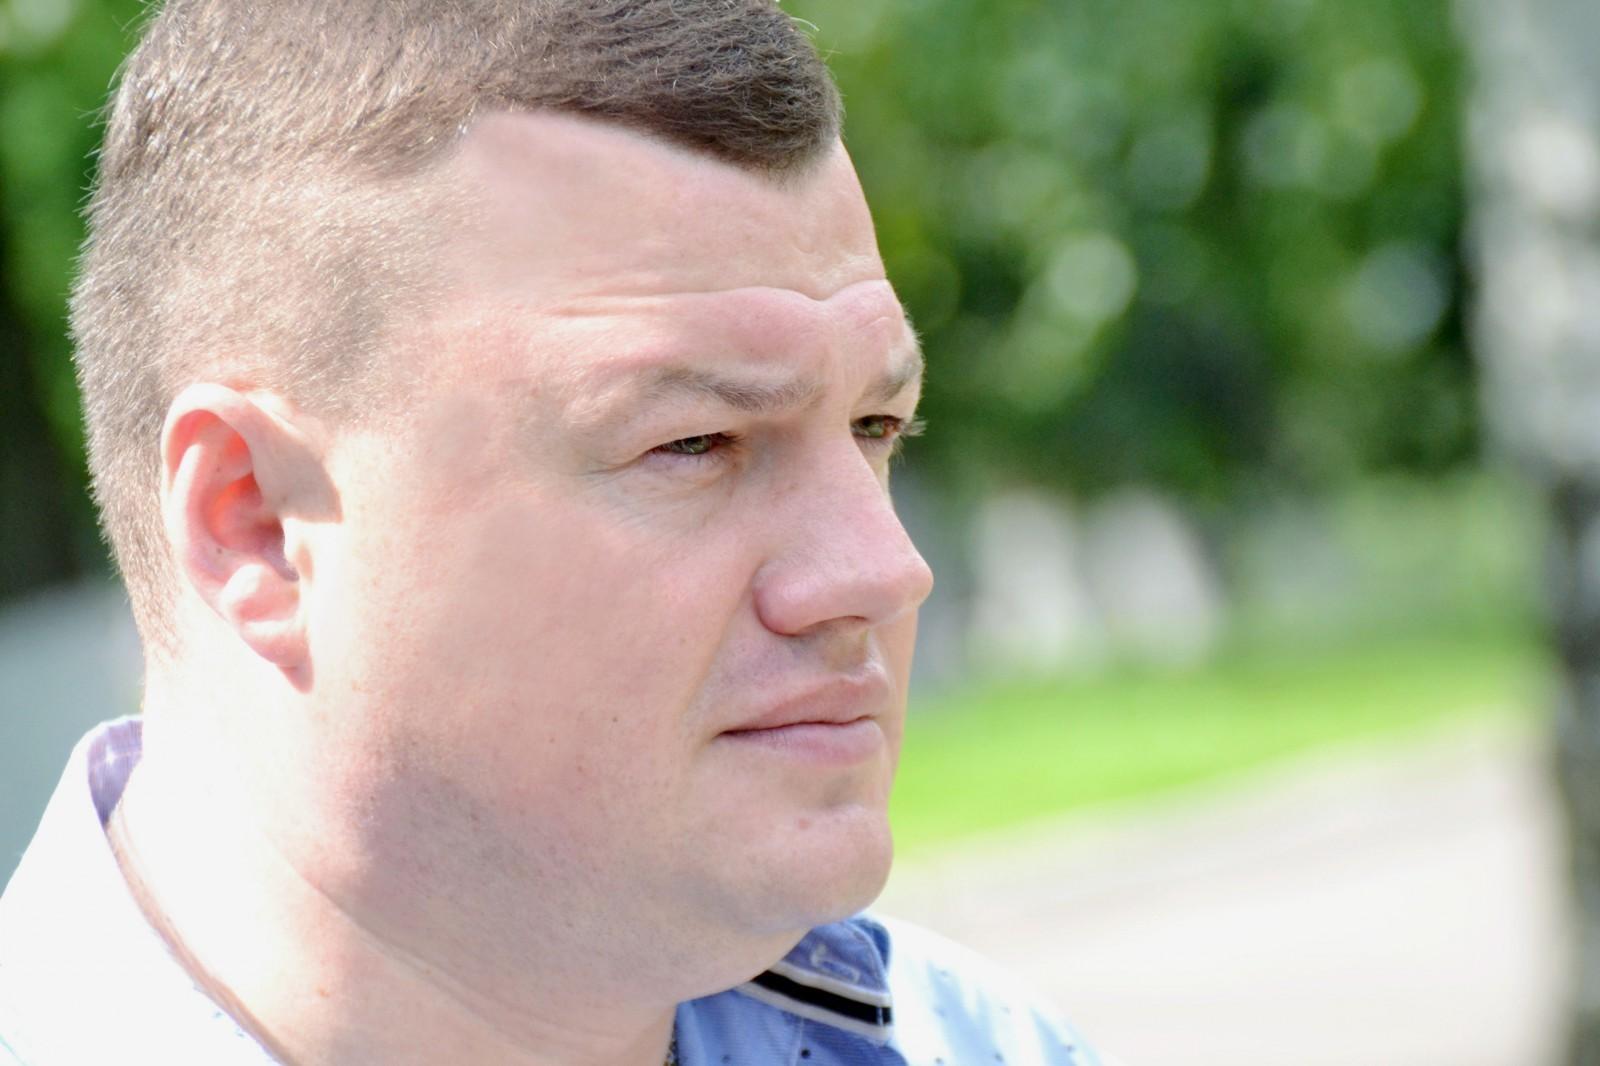 Александр Никитин занял 25 место в медиарейтинге глав регионов в сфере ЖКХ